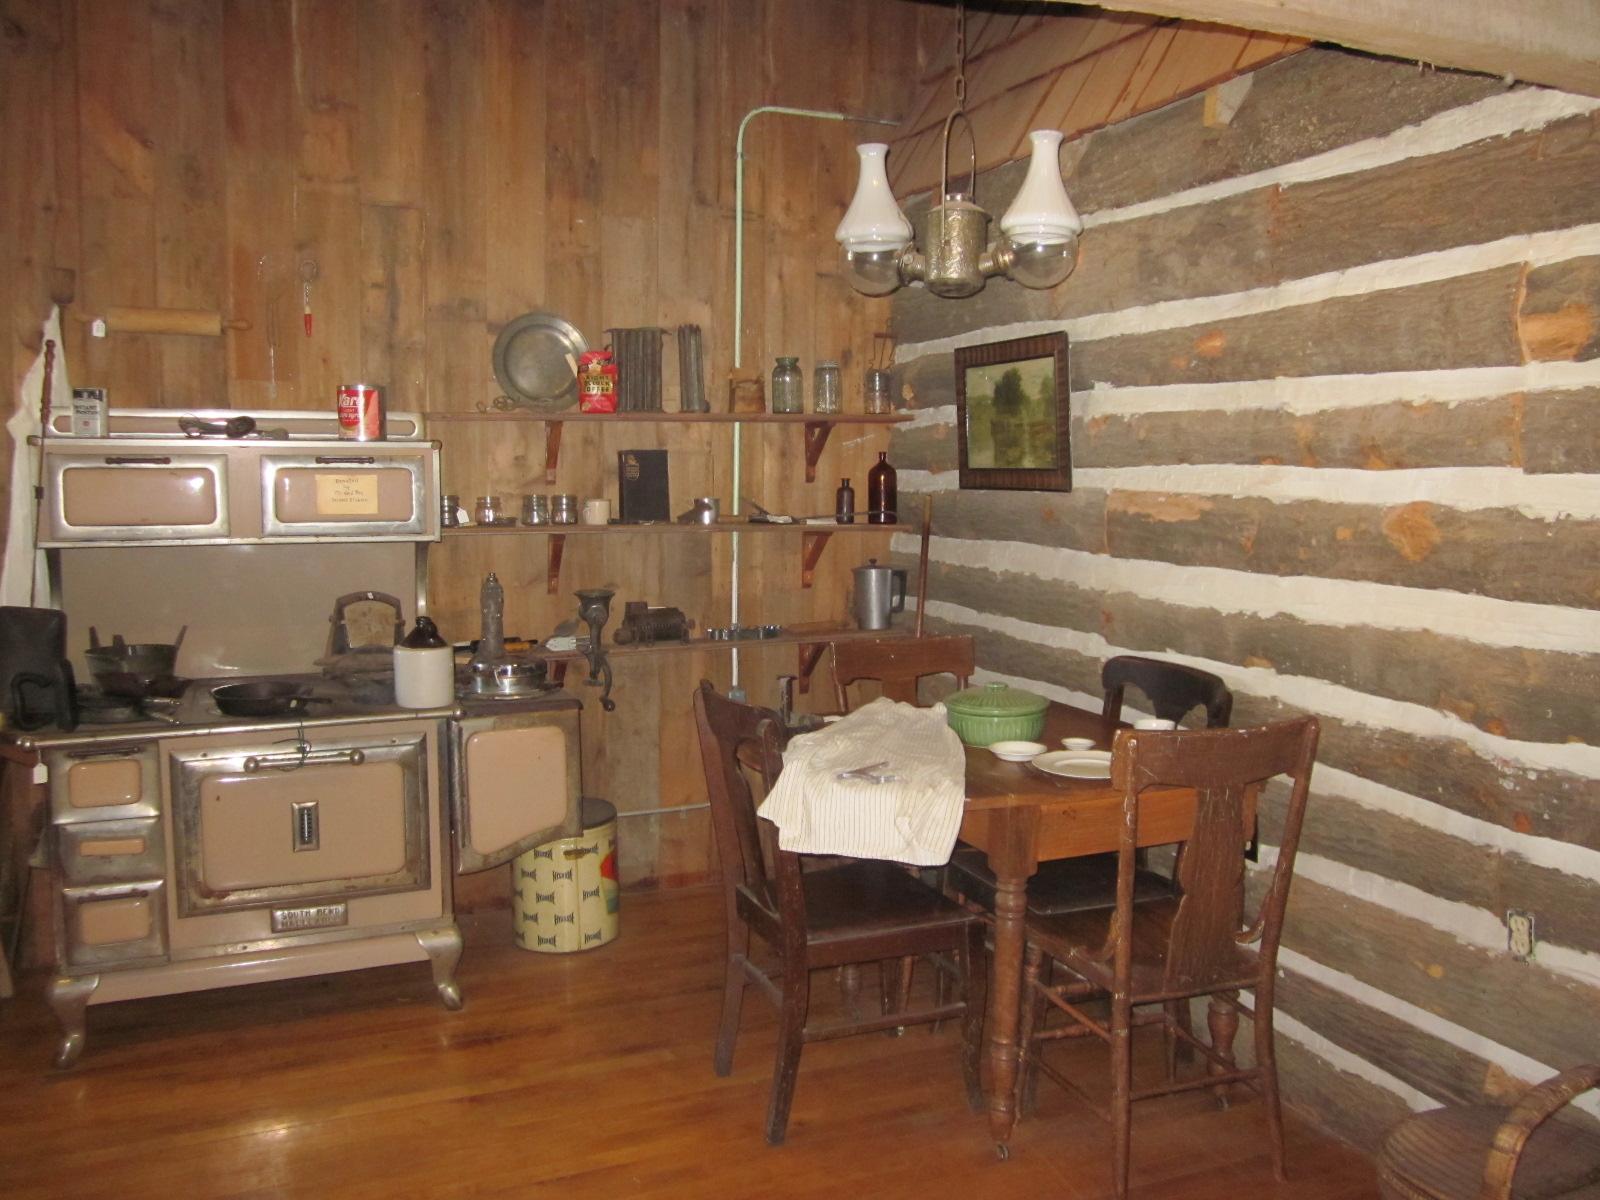 Log Cabin Wallpaper Exterior of log cabin 1600x1200